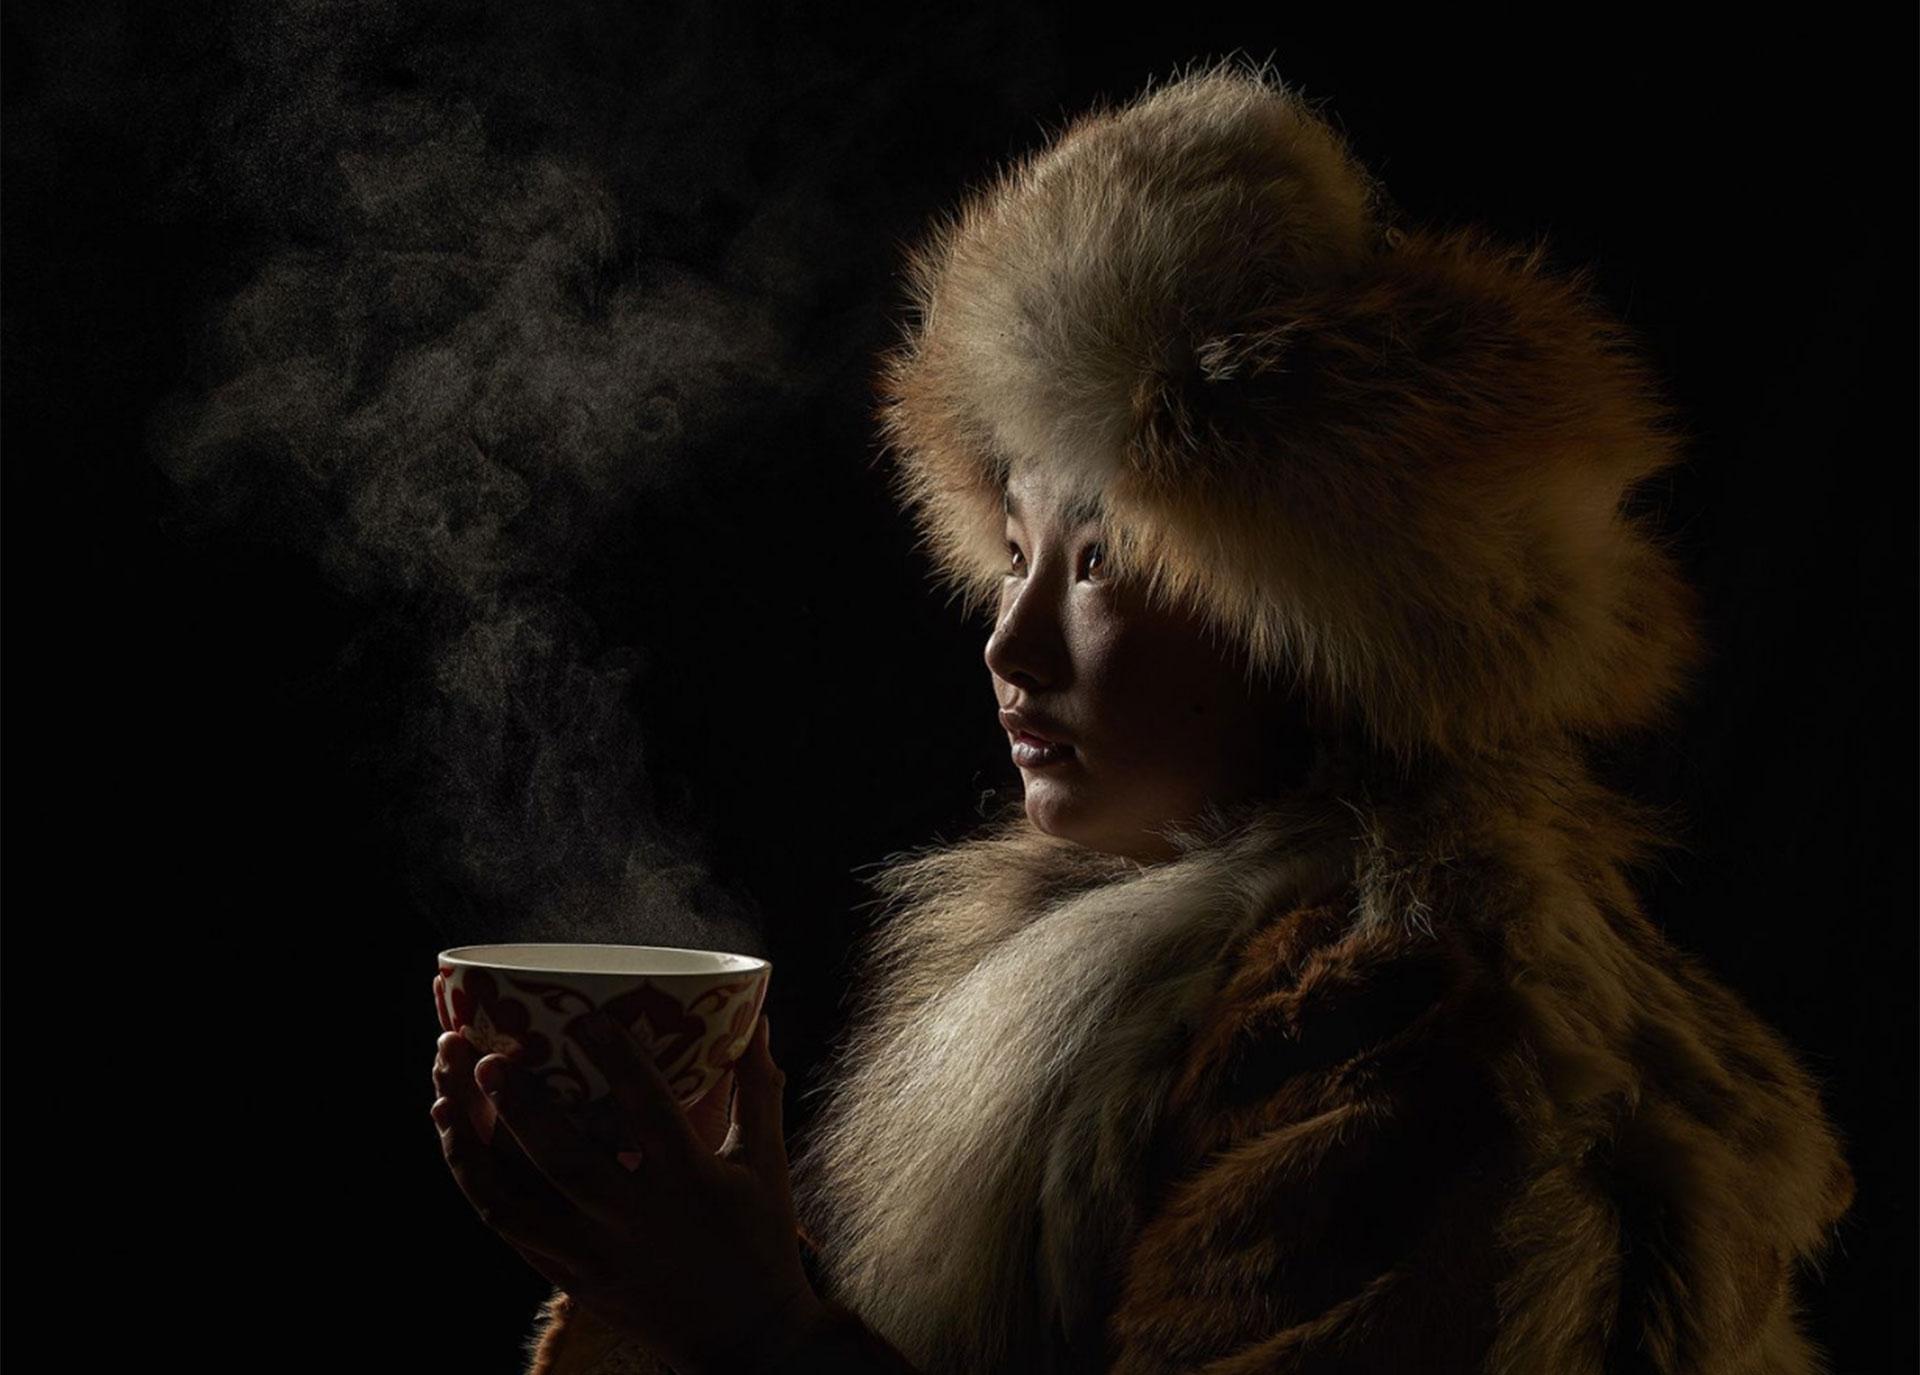 """Cultura del té"". ölgiy, Bayan-Oelgiy, Mongolia."